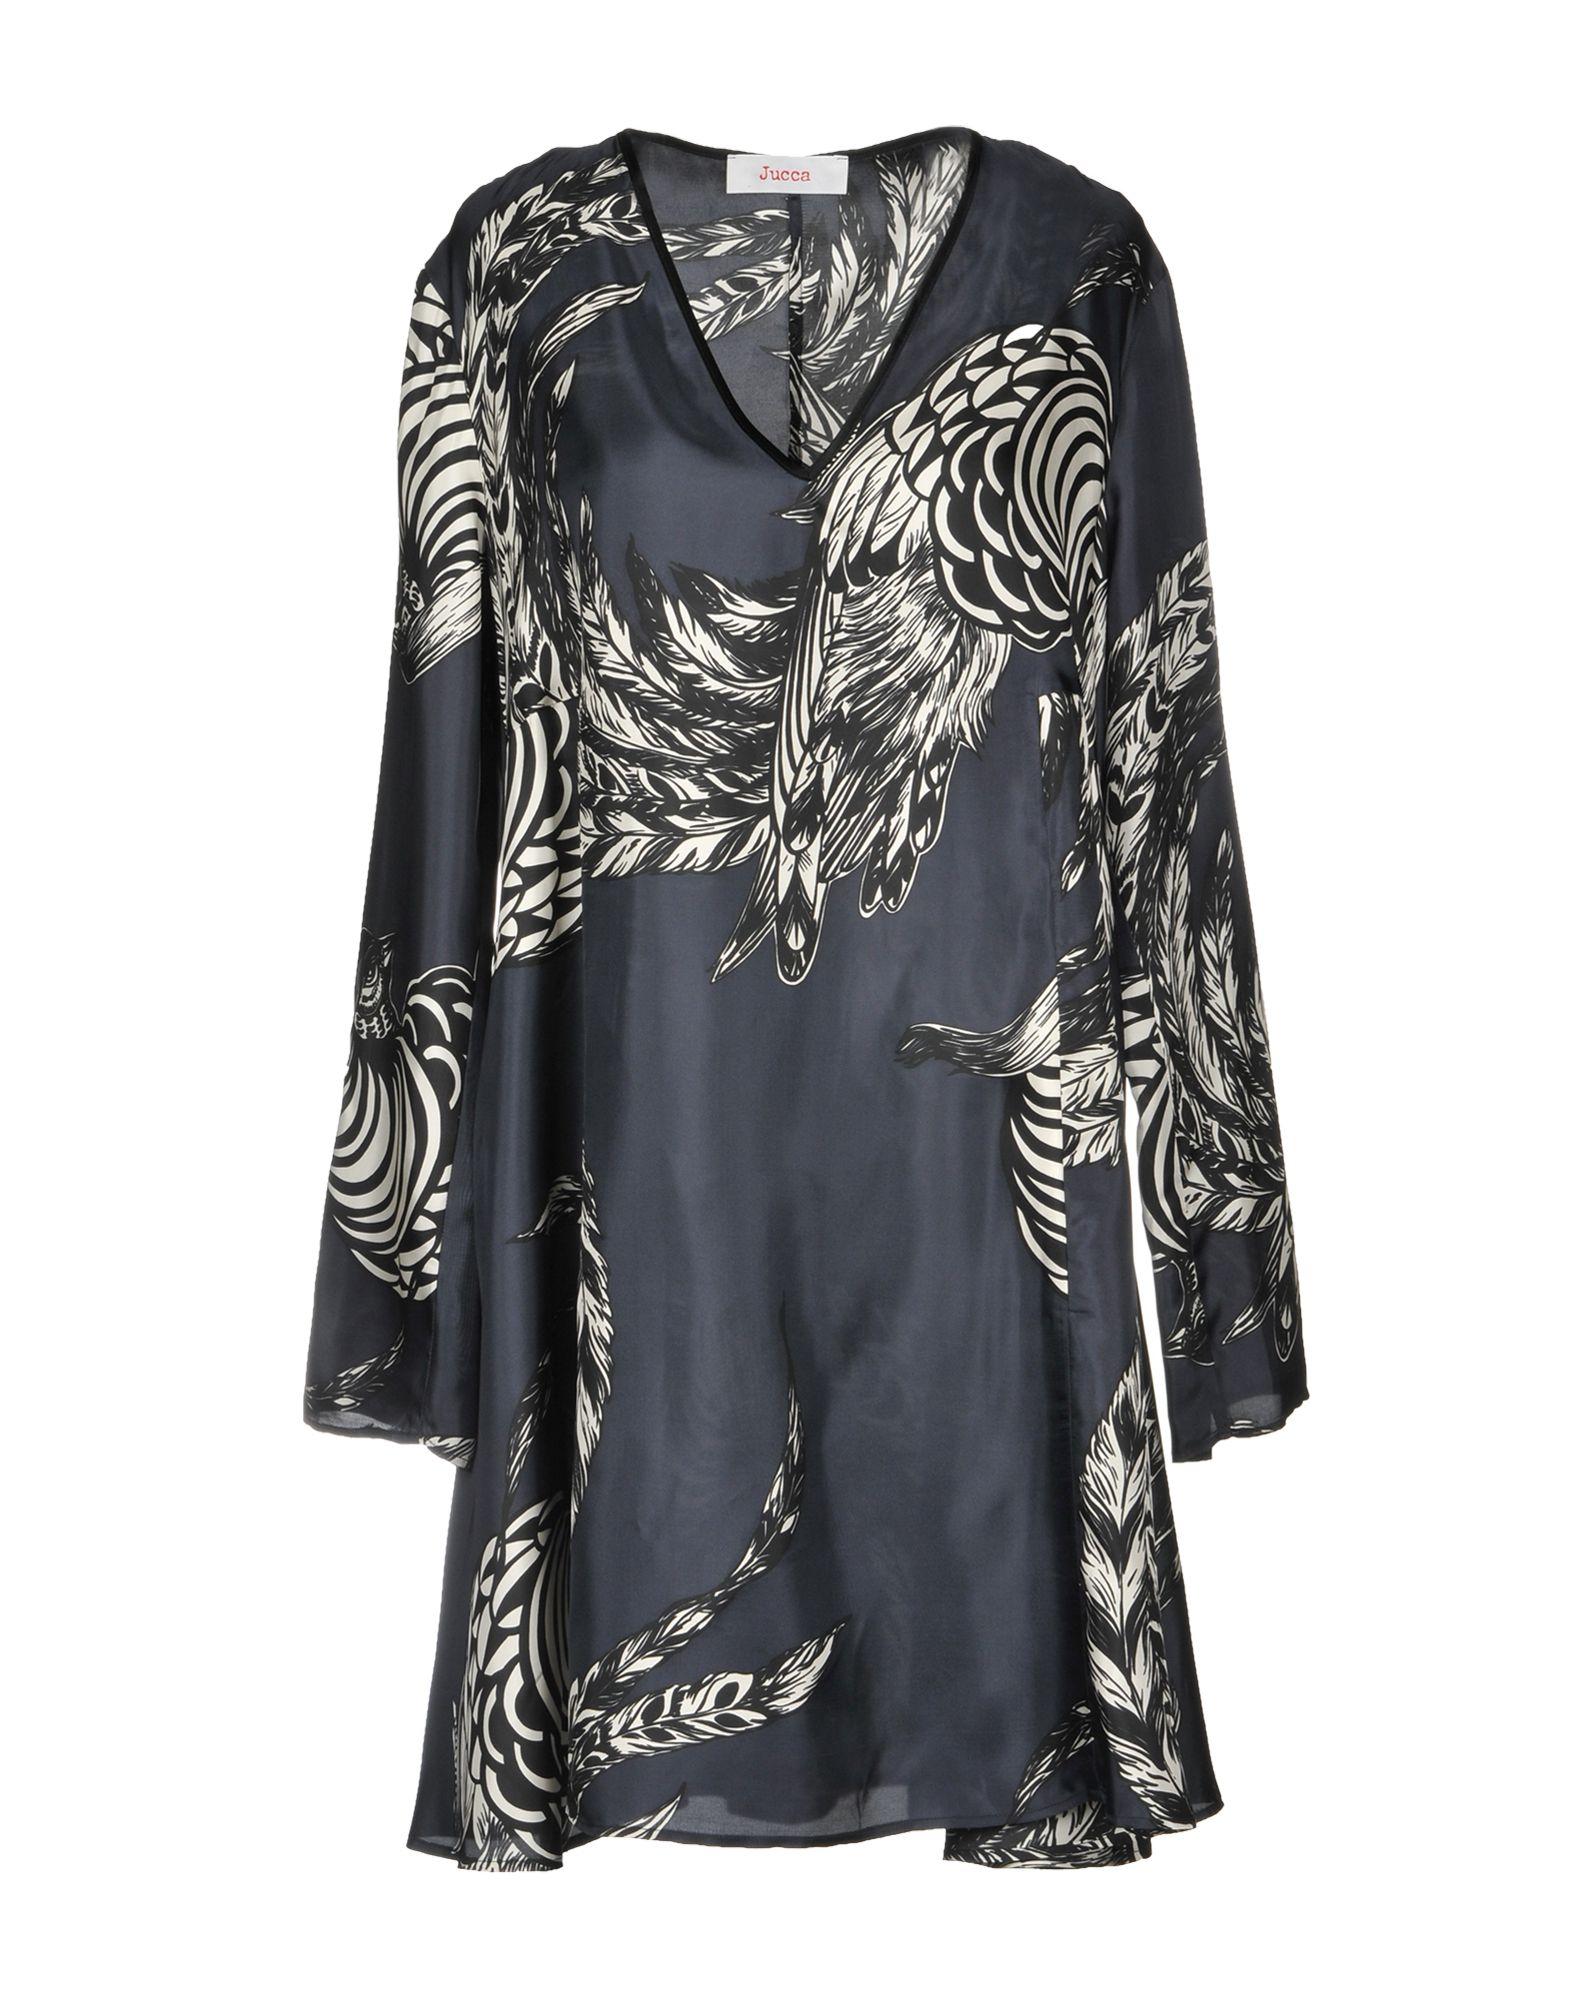 JUCCA Short Dress in Dark Blue